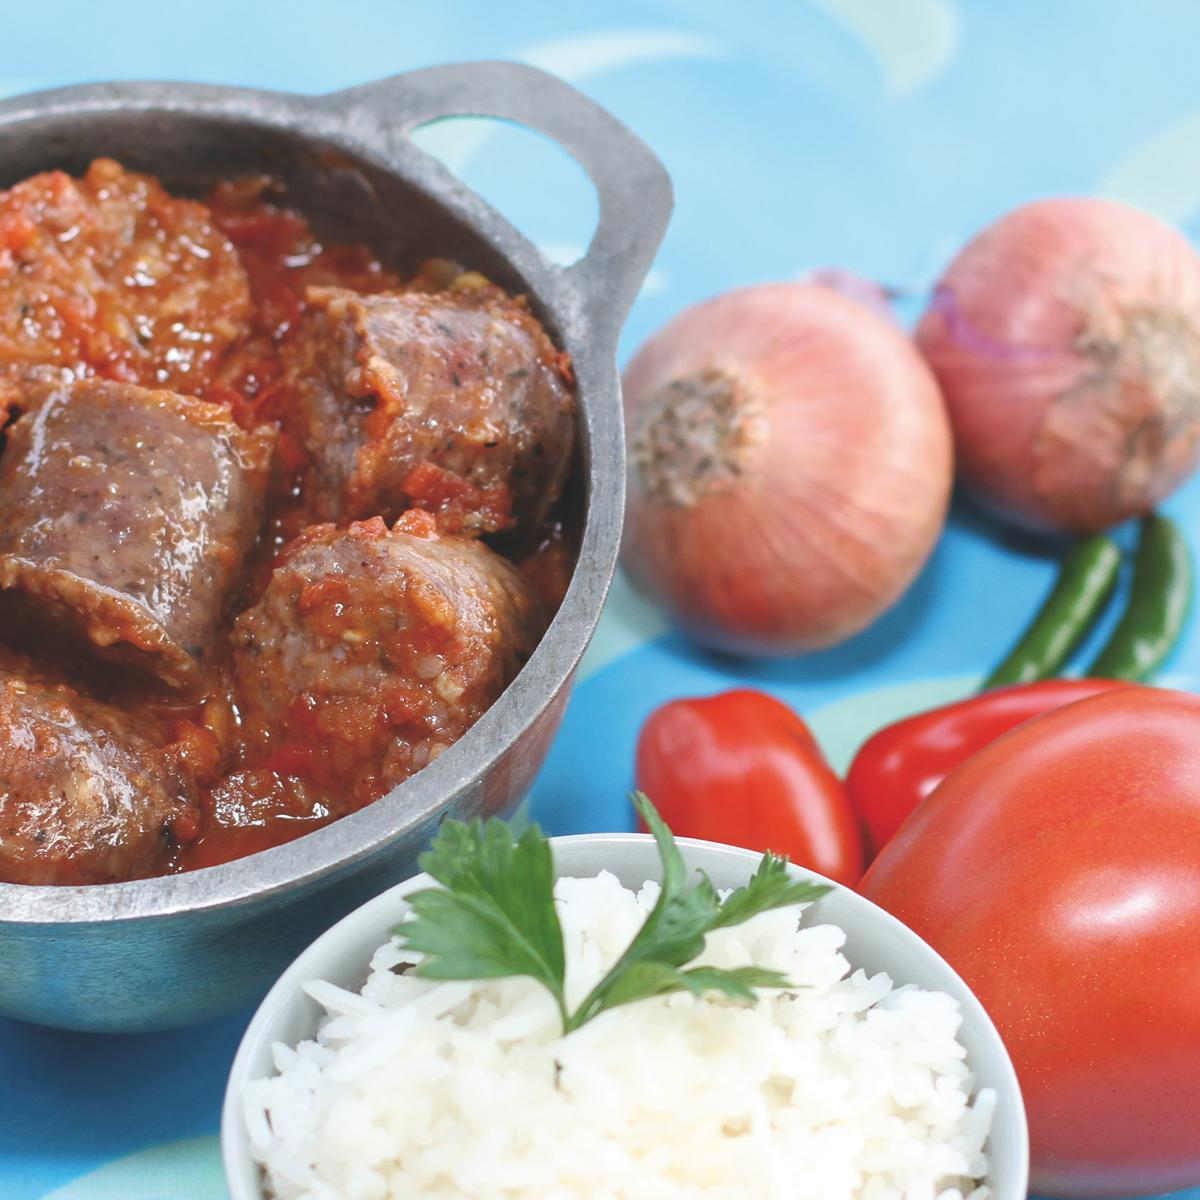 Recette rougail saucisses cuisine madame figaro - Cuisine reunionnaise recette ...